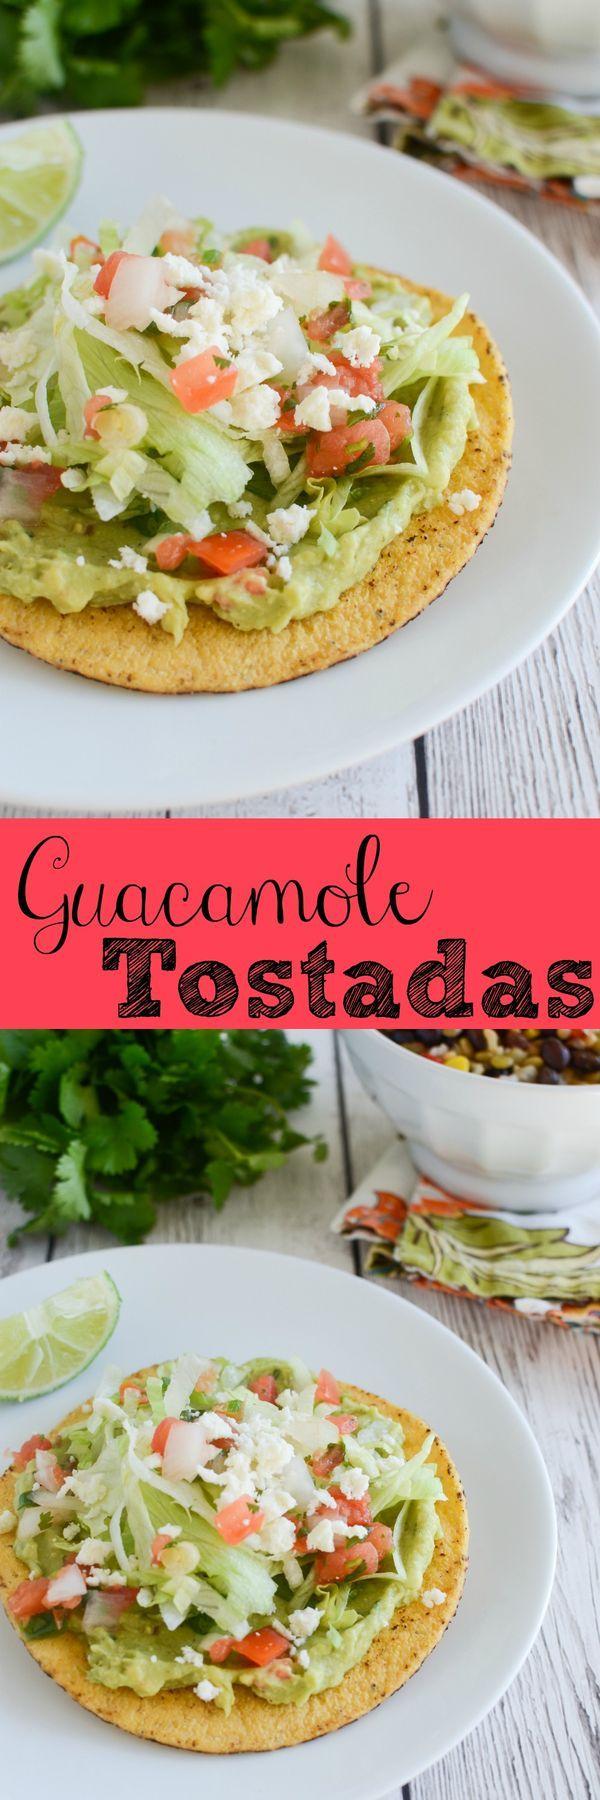 Guacamole Tostadas - delicious meatless meal! Tostadas topped with guacamole, queso fresco, and fresh salsa!